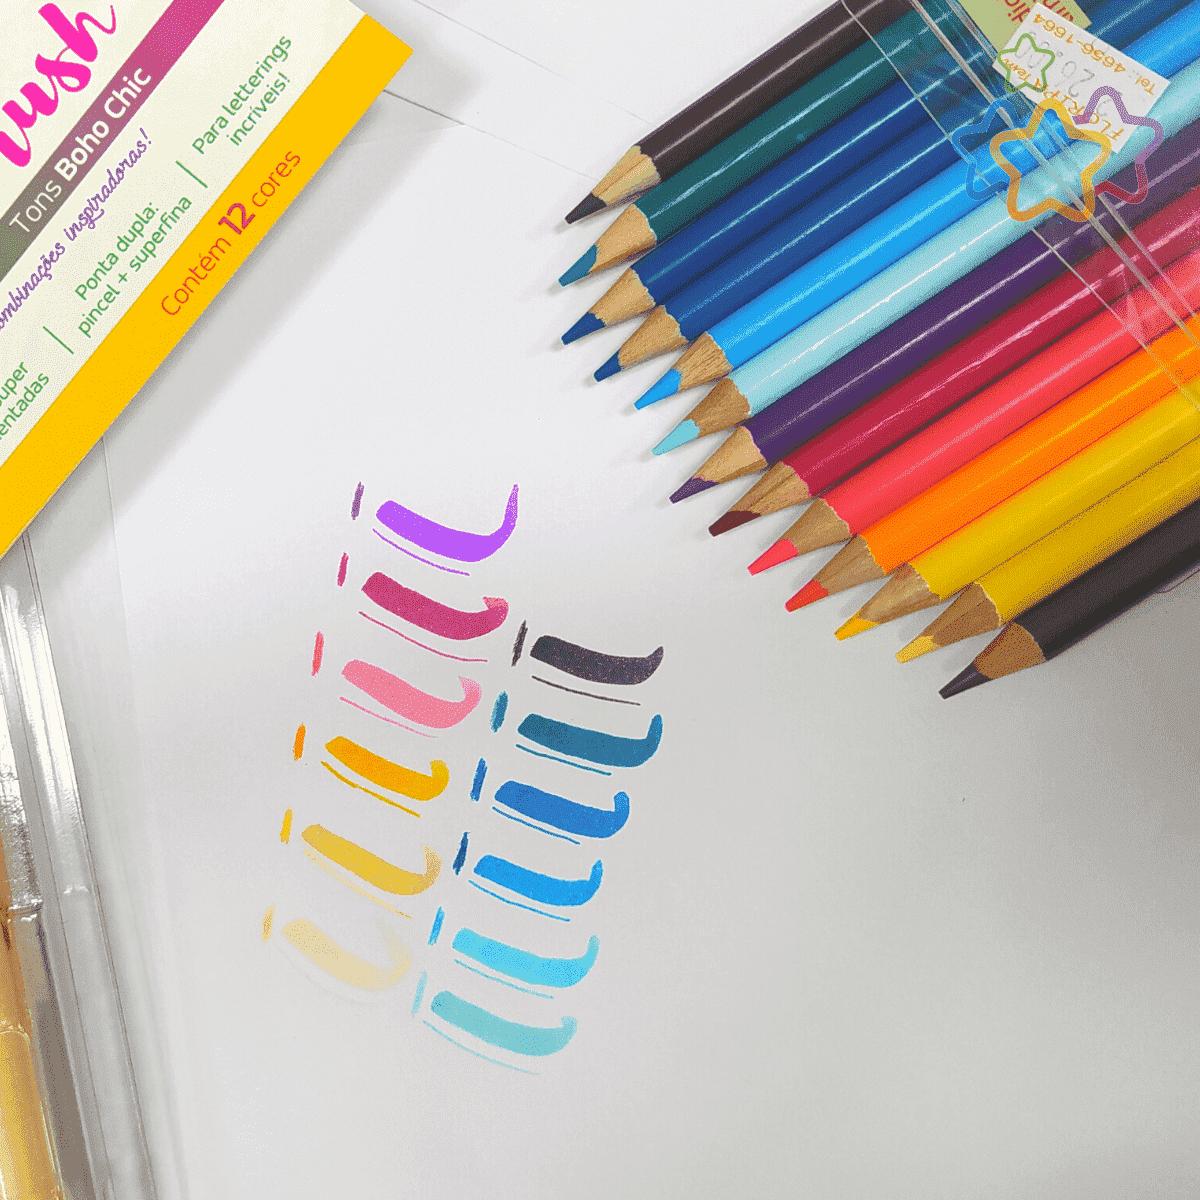 Lápis de Cor 12 cores Tons Boho Chic - Tris